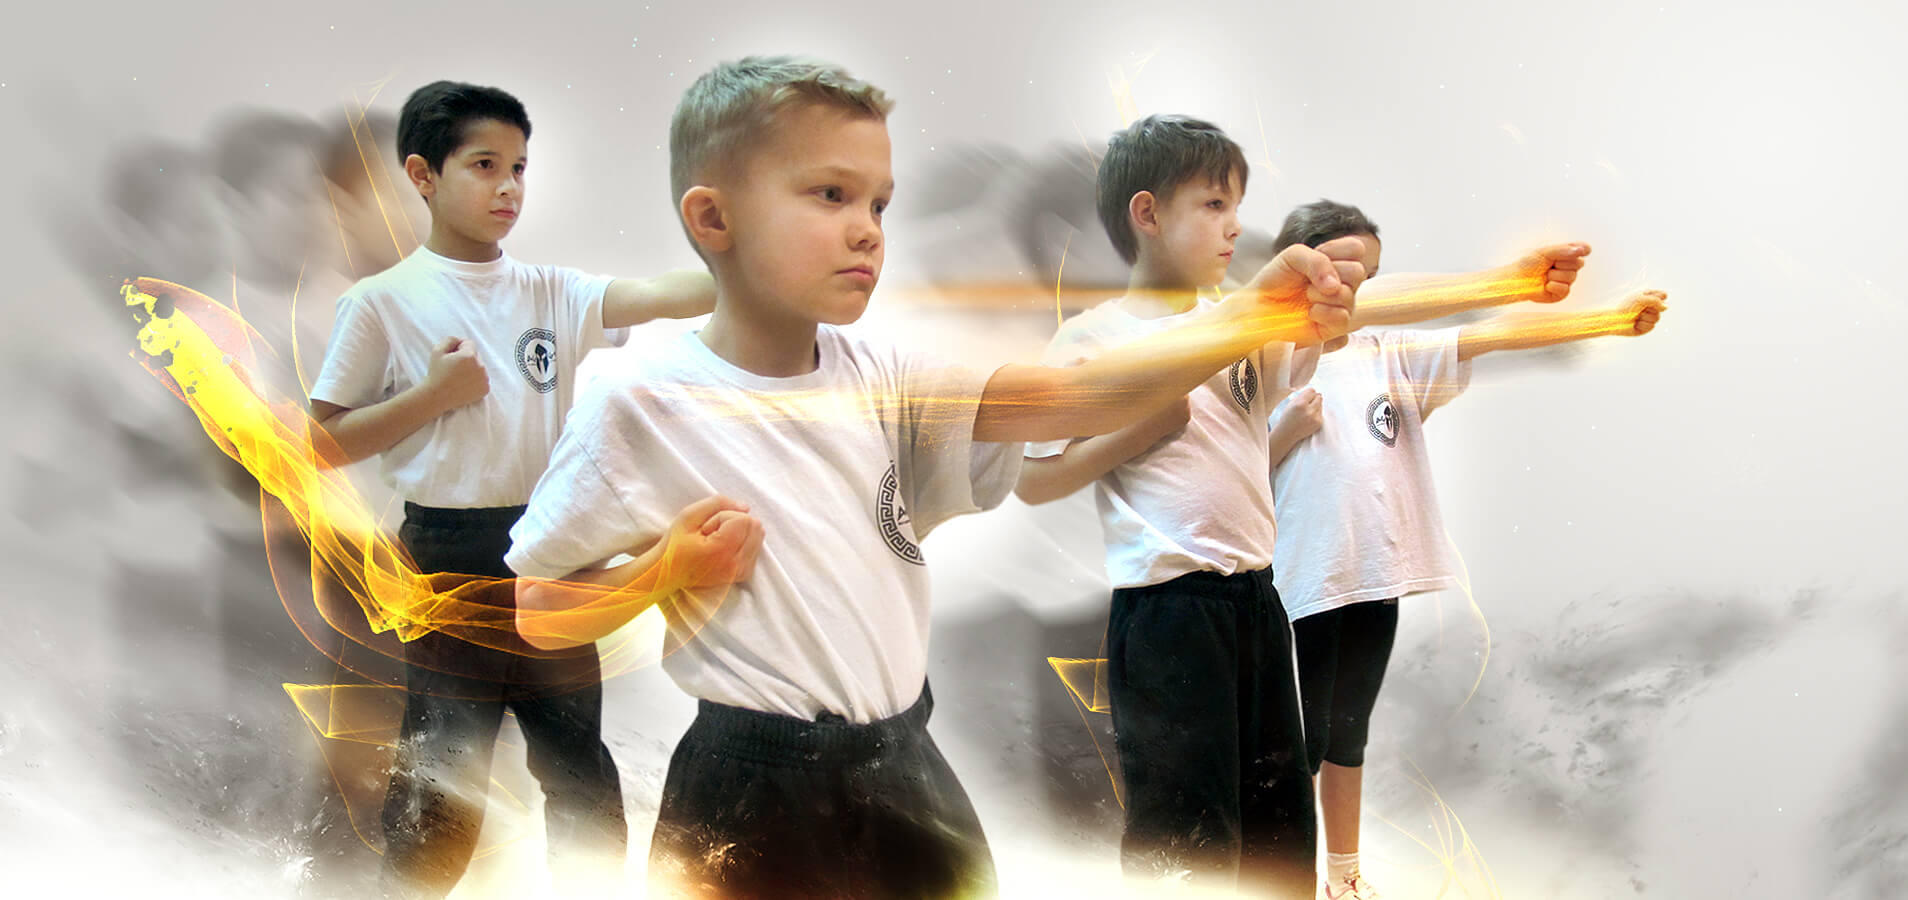 Kung Fu für Kinder, Ludwigsburg, Waiblingen, Stuttgart, Esslingen, Bad Cannstatt